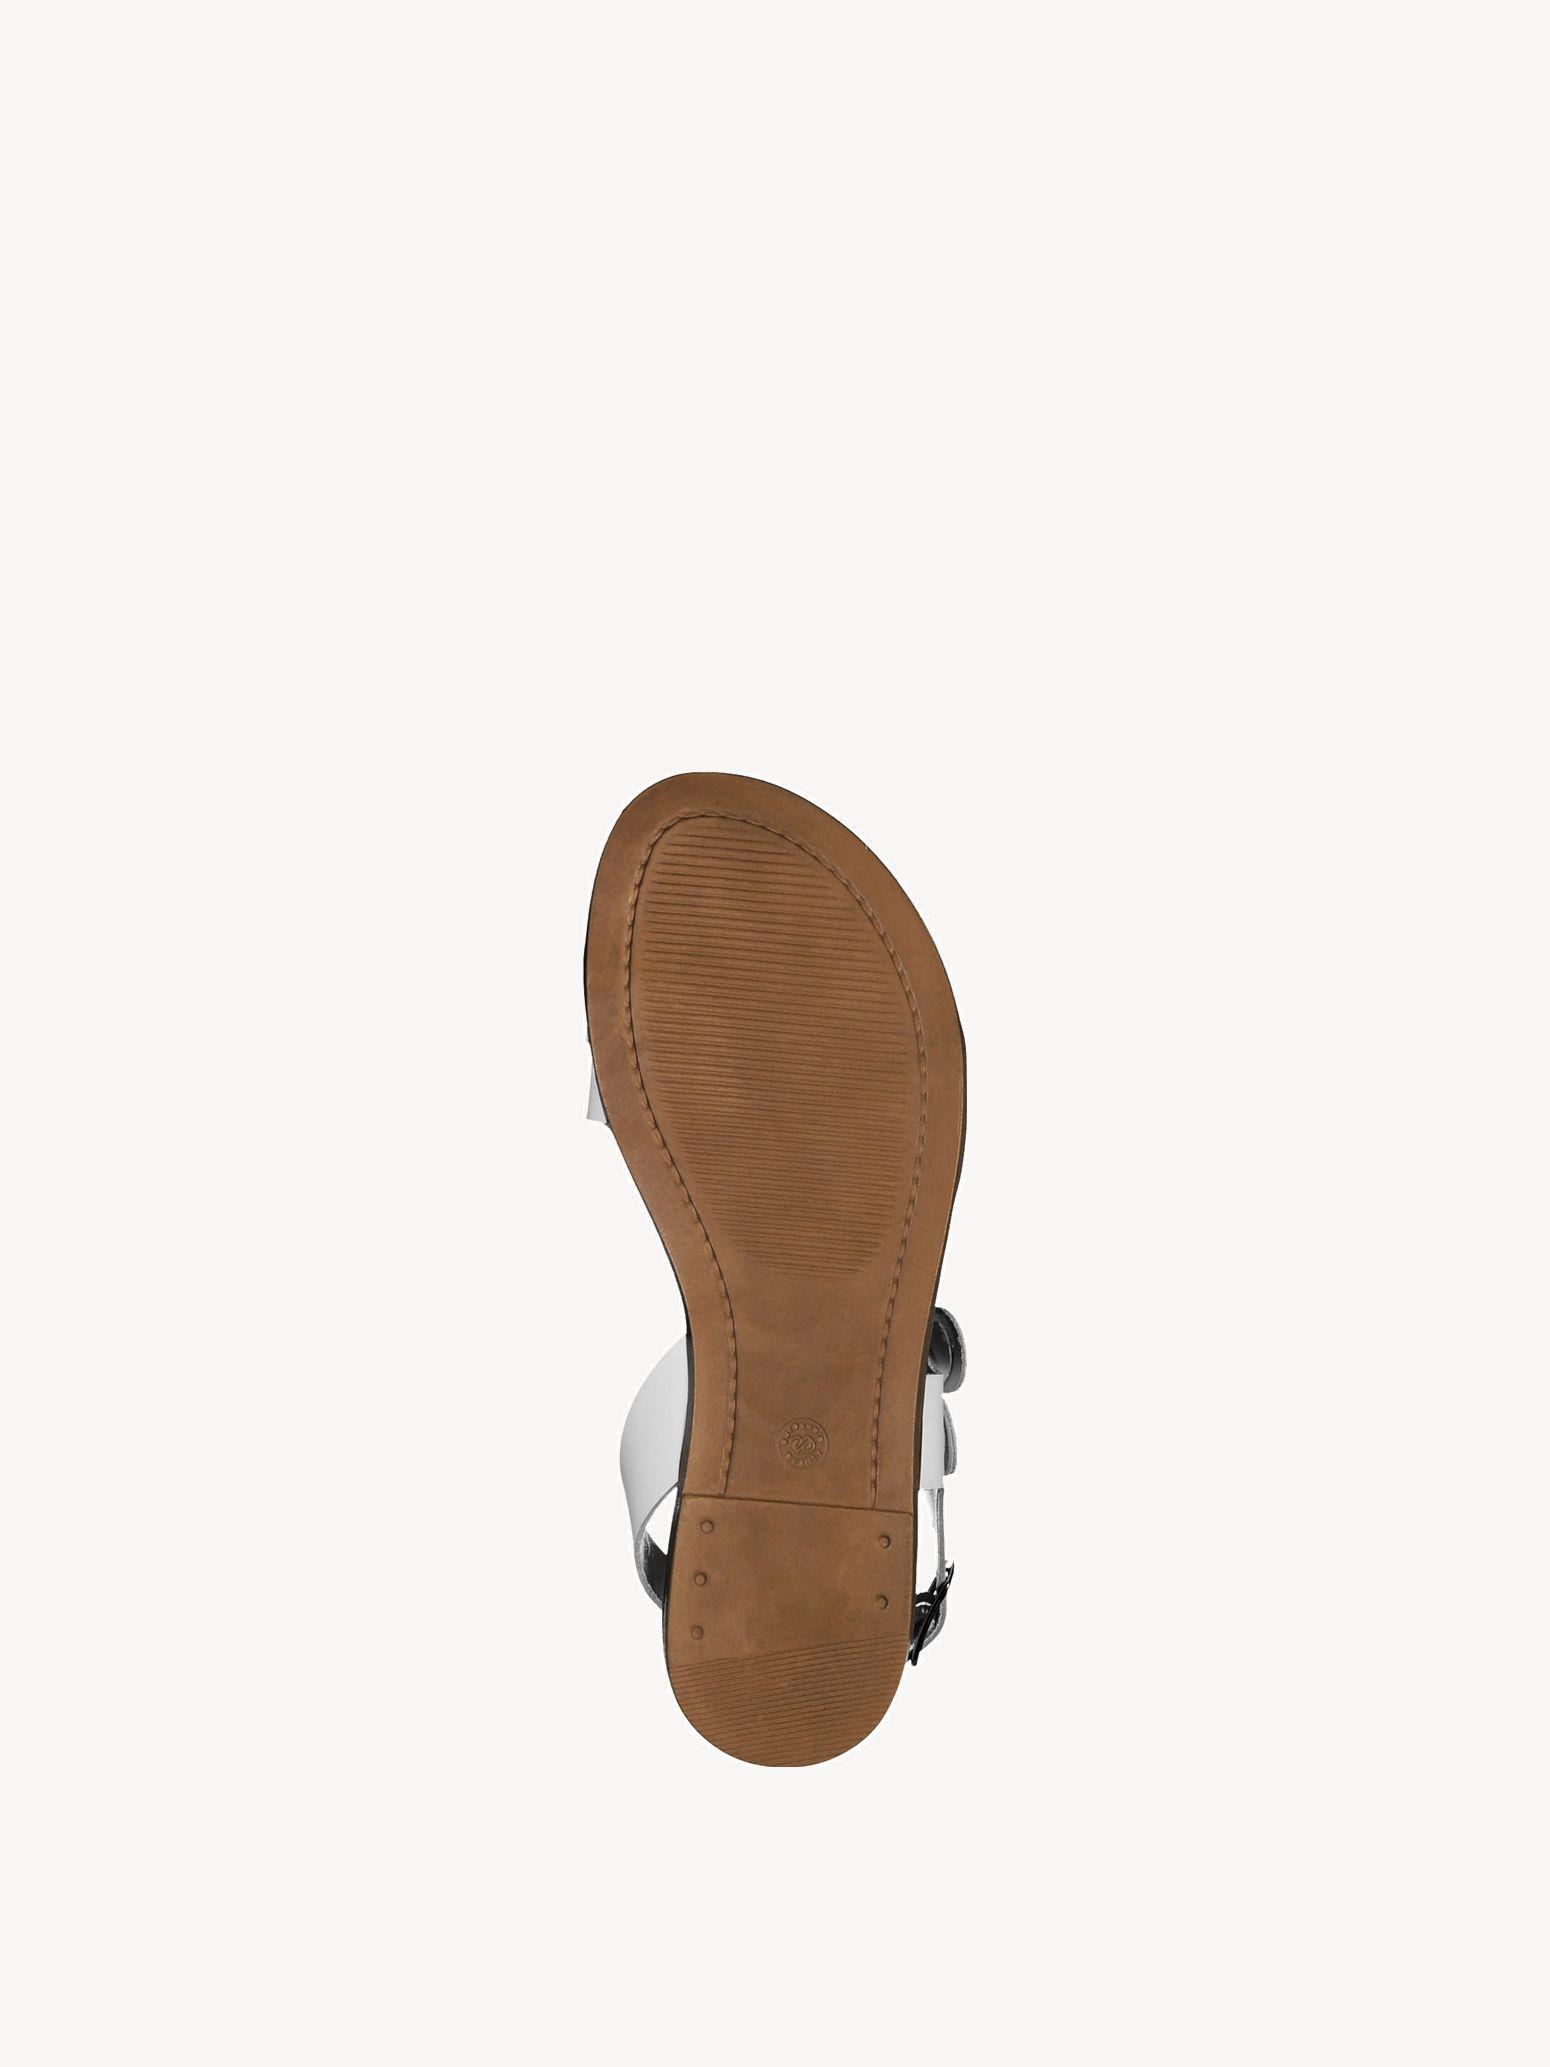 2018 sneakers fashion detailing Sandal